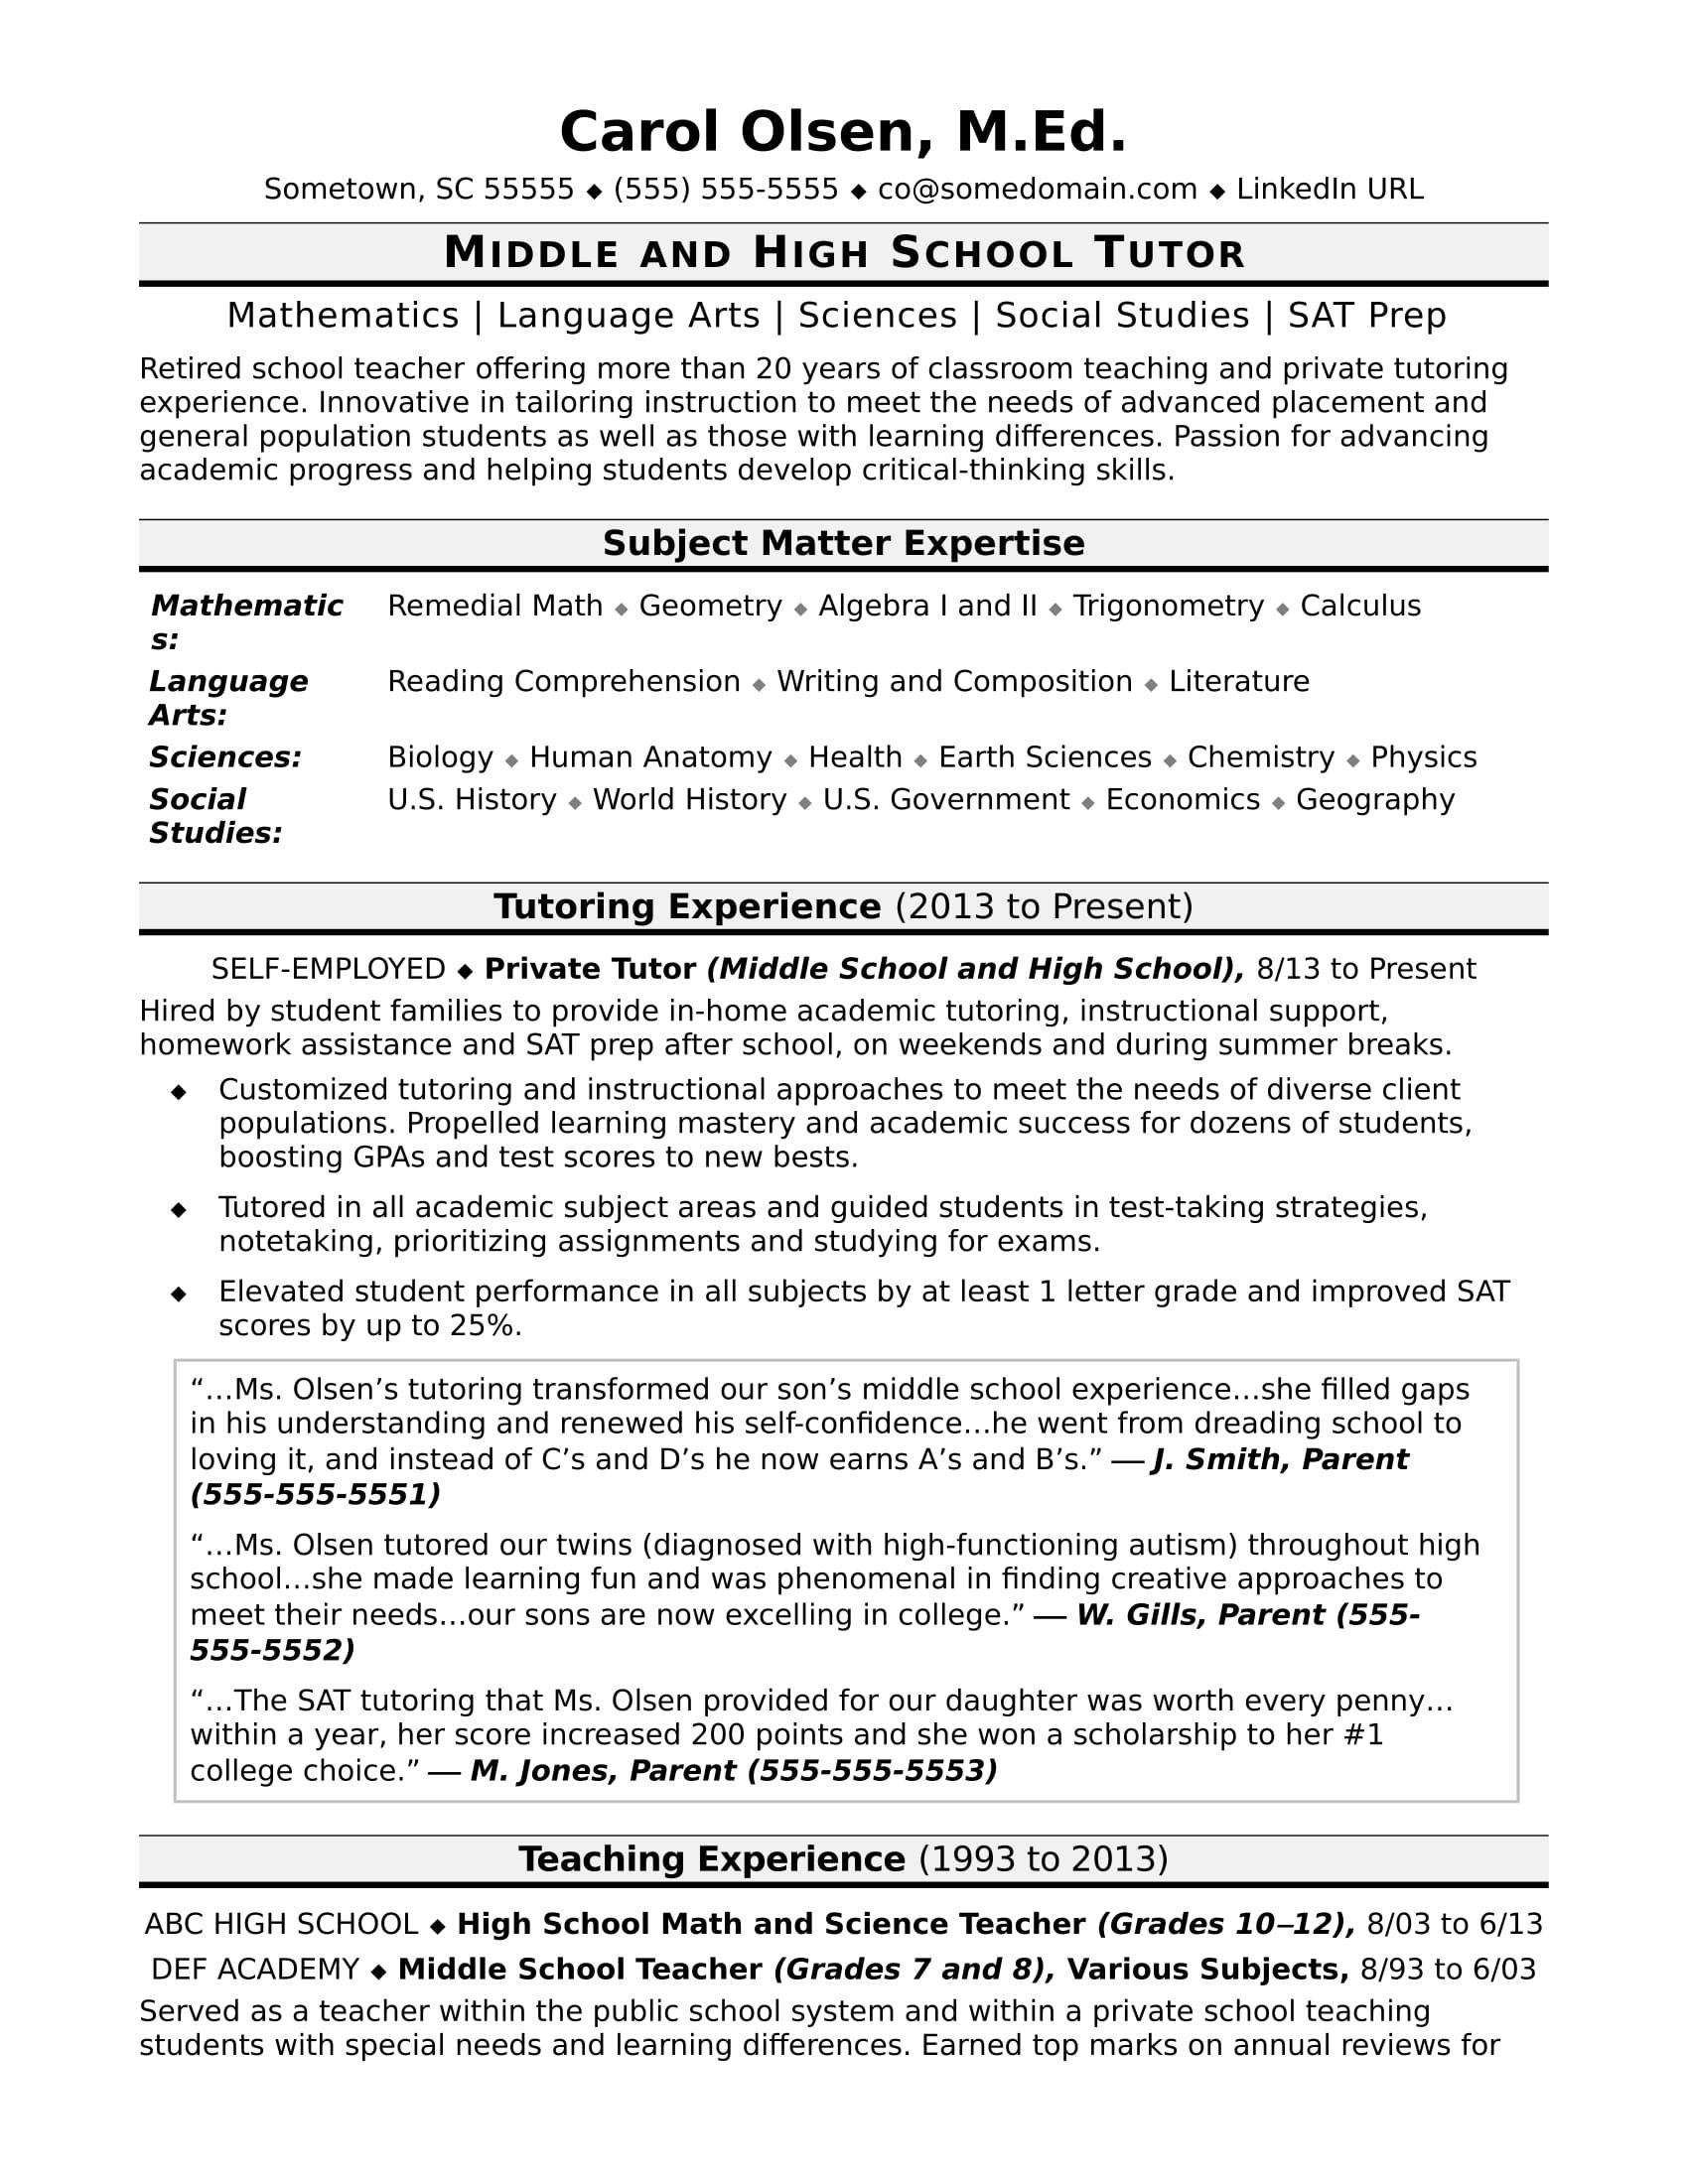 Tutor Resume Sample Student Resume Template High School Resume Template Business Resume Template